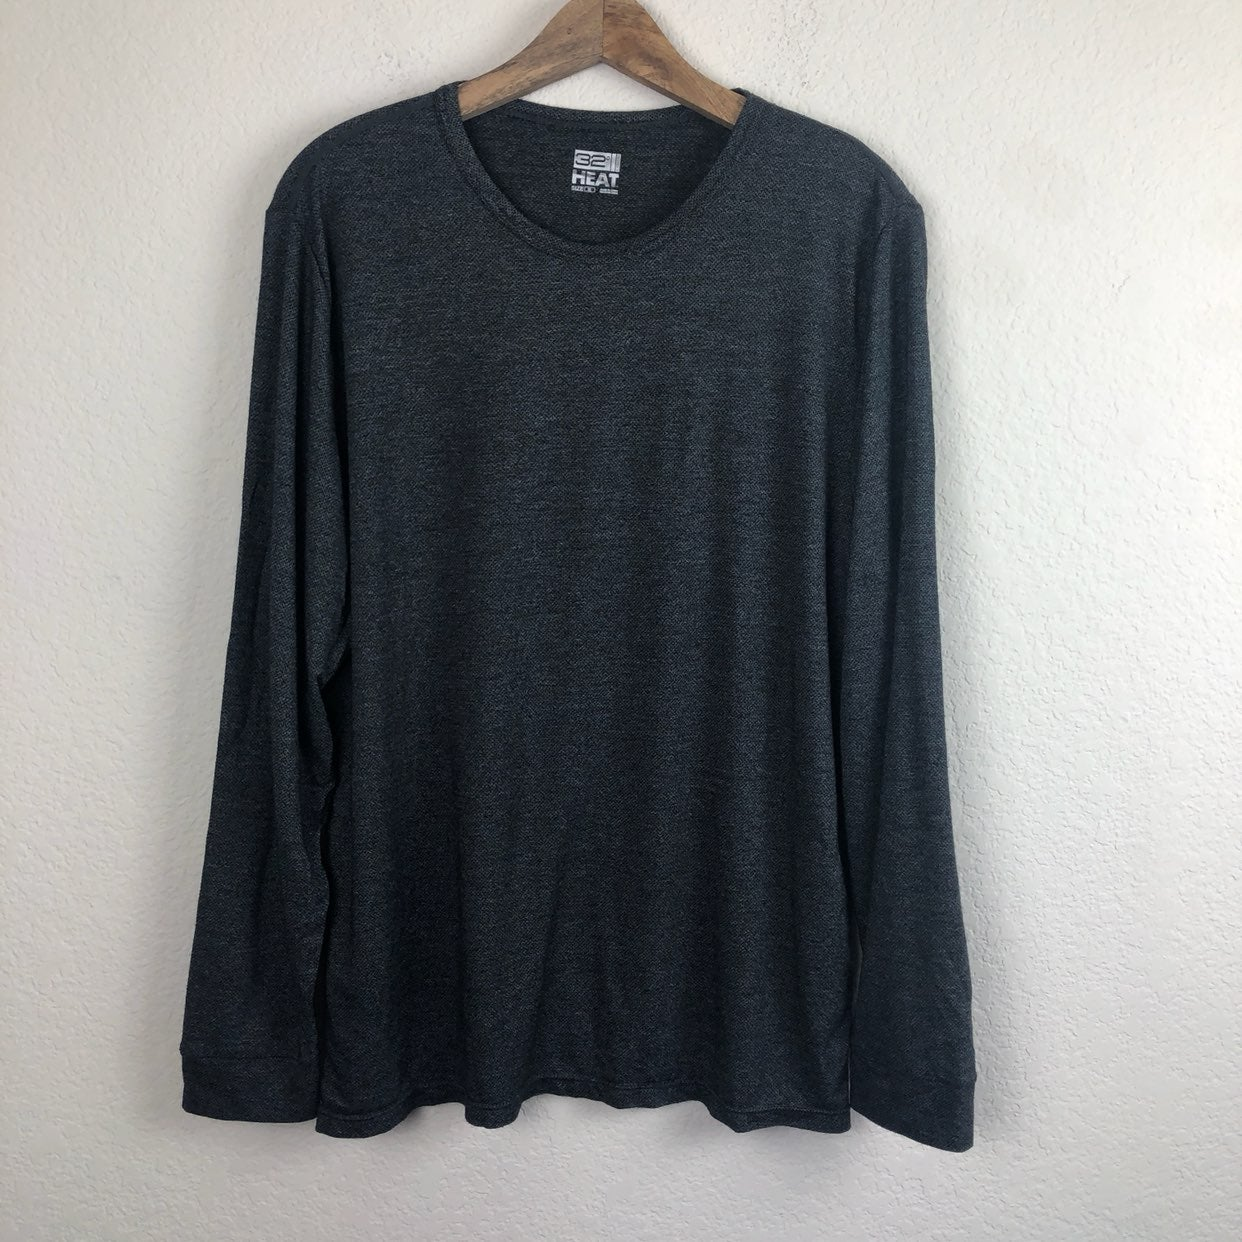 32 Degrees Heat Gray Long Sleeve XL